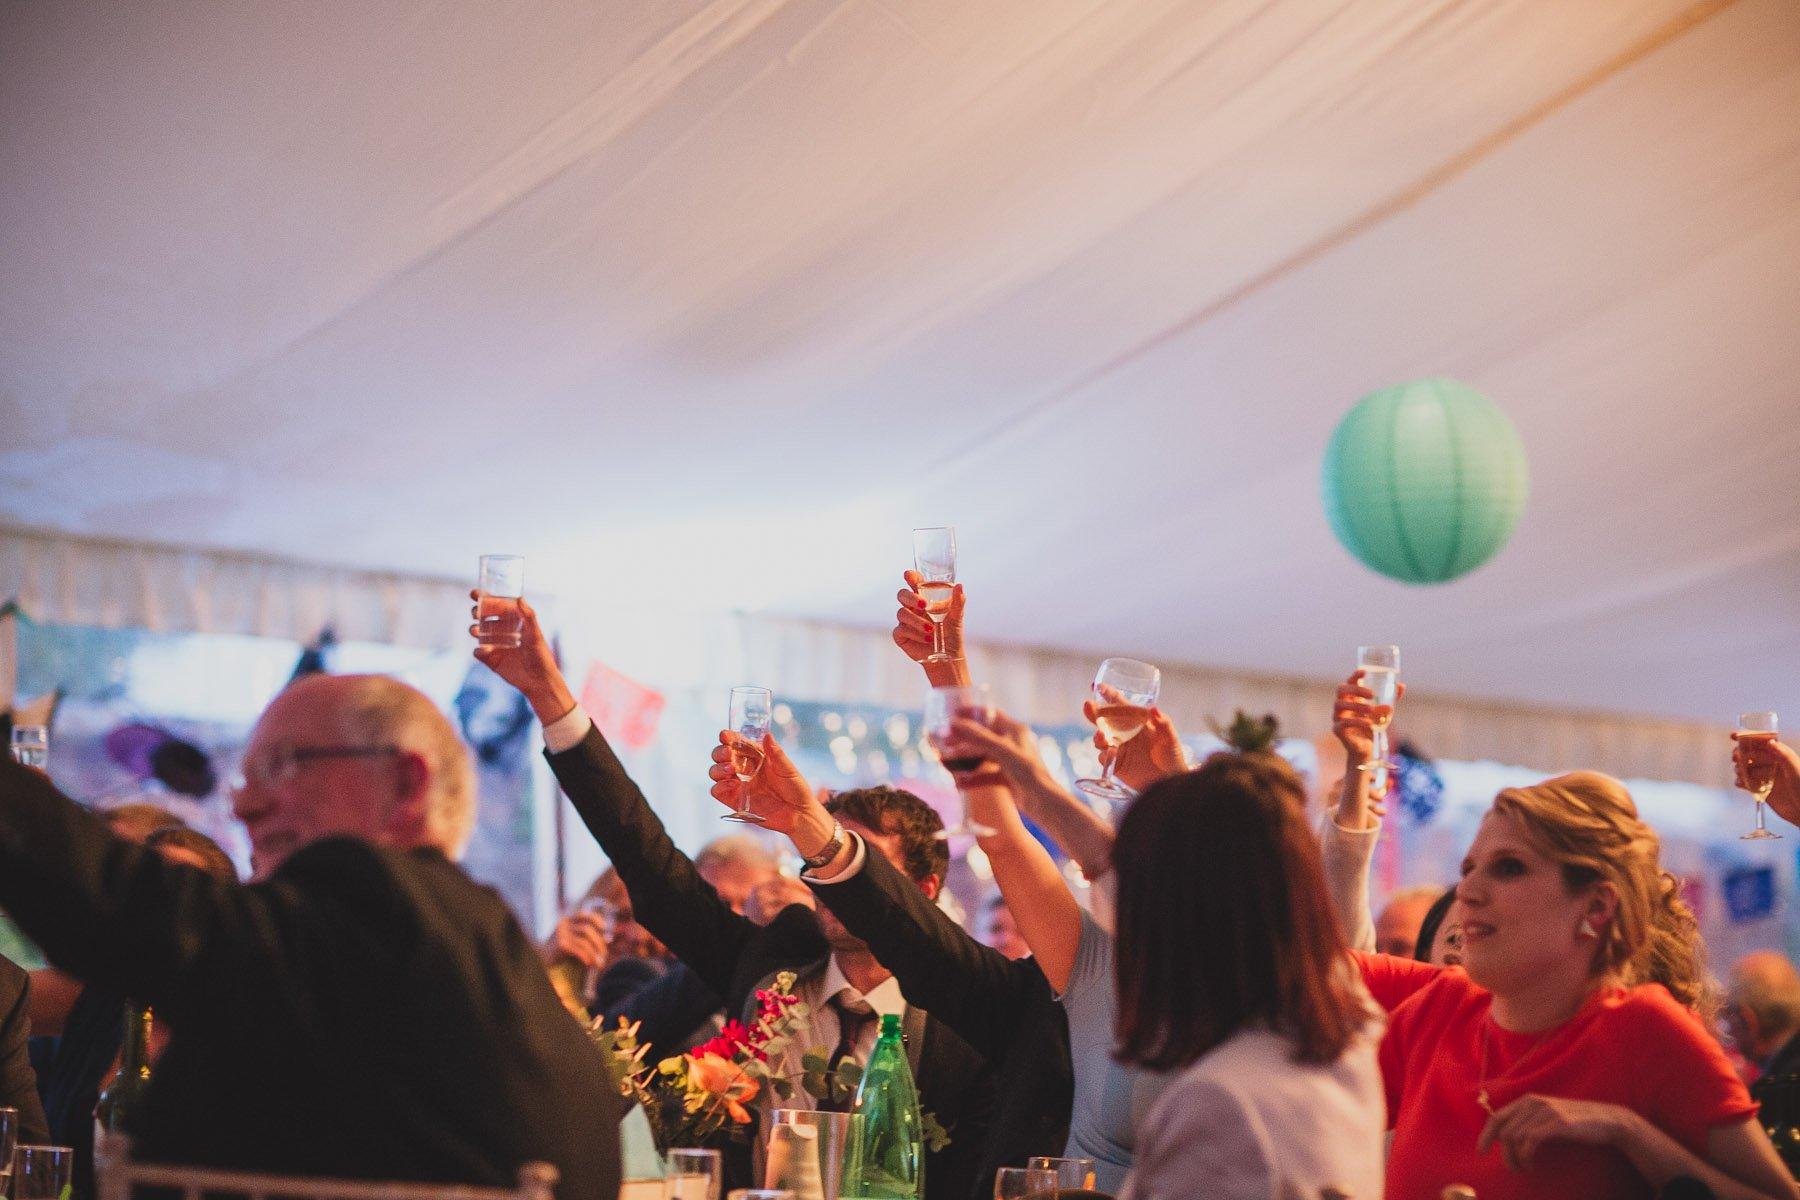 Buckinghamshire-Wedding-Lizzie-Duncan-142